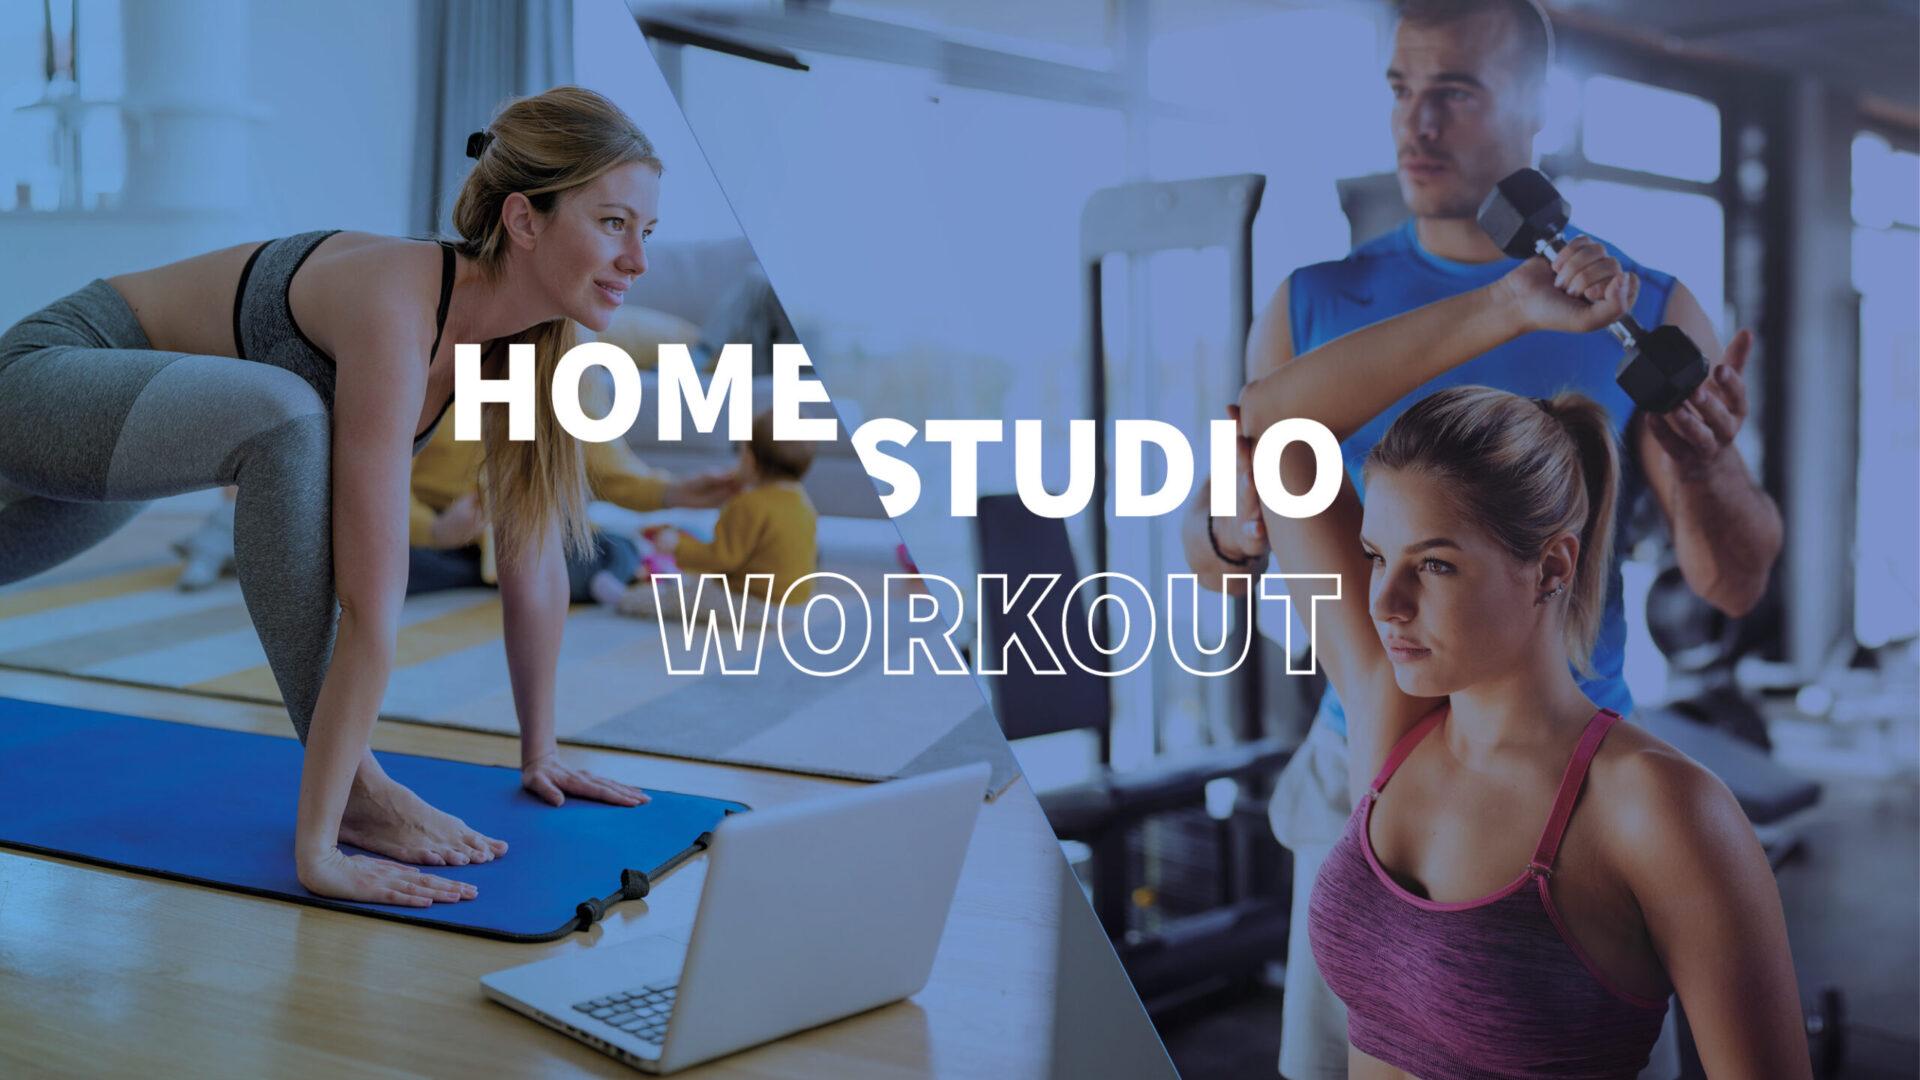 Training im Studio vs. Training zu Hause